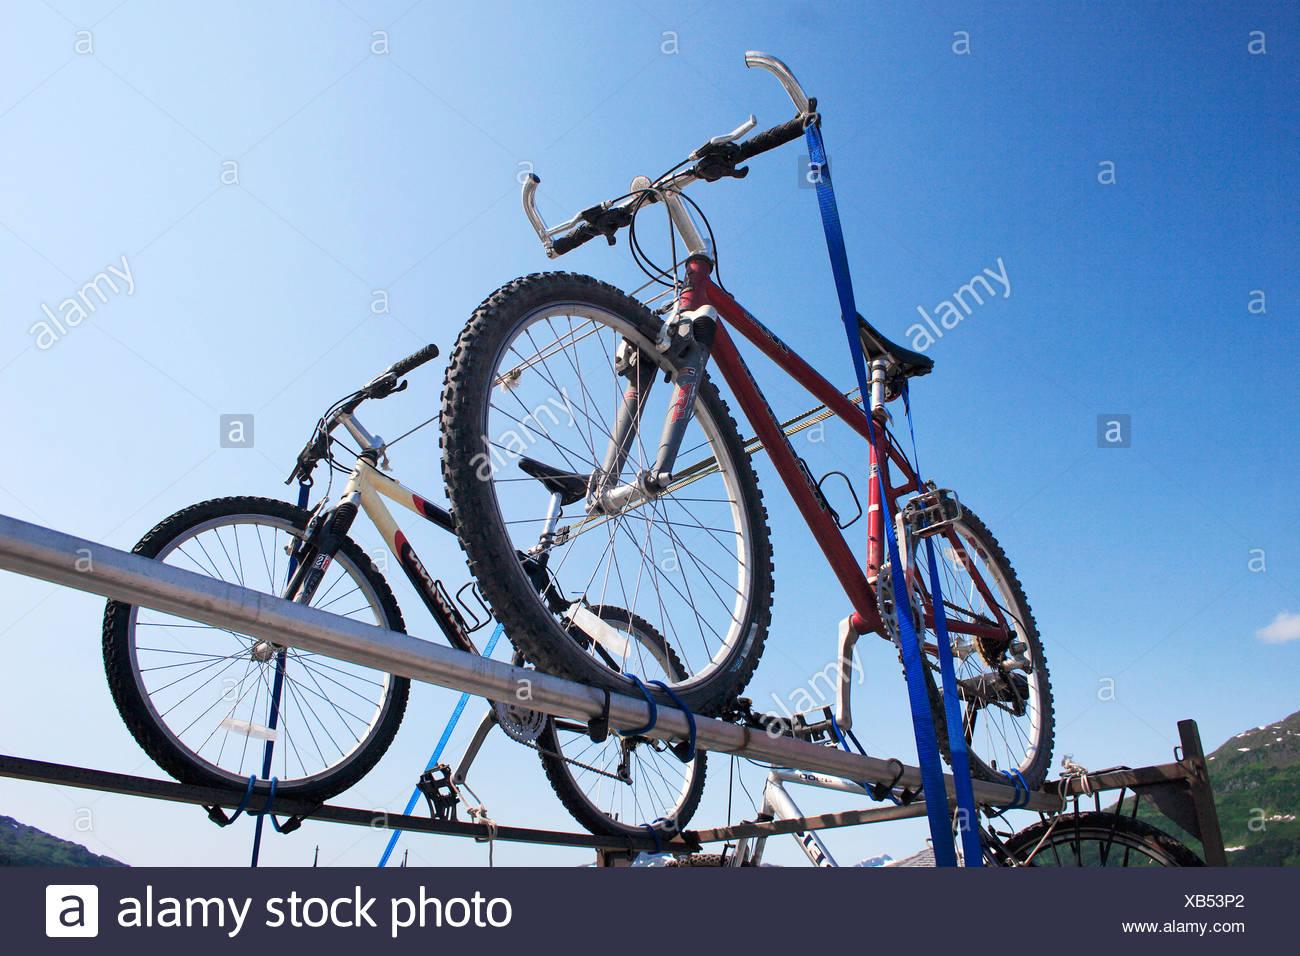 Cycle Mounted Stockfotos & Cycle Mounted Bilder - Alamy